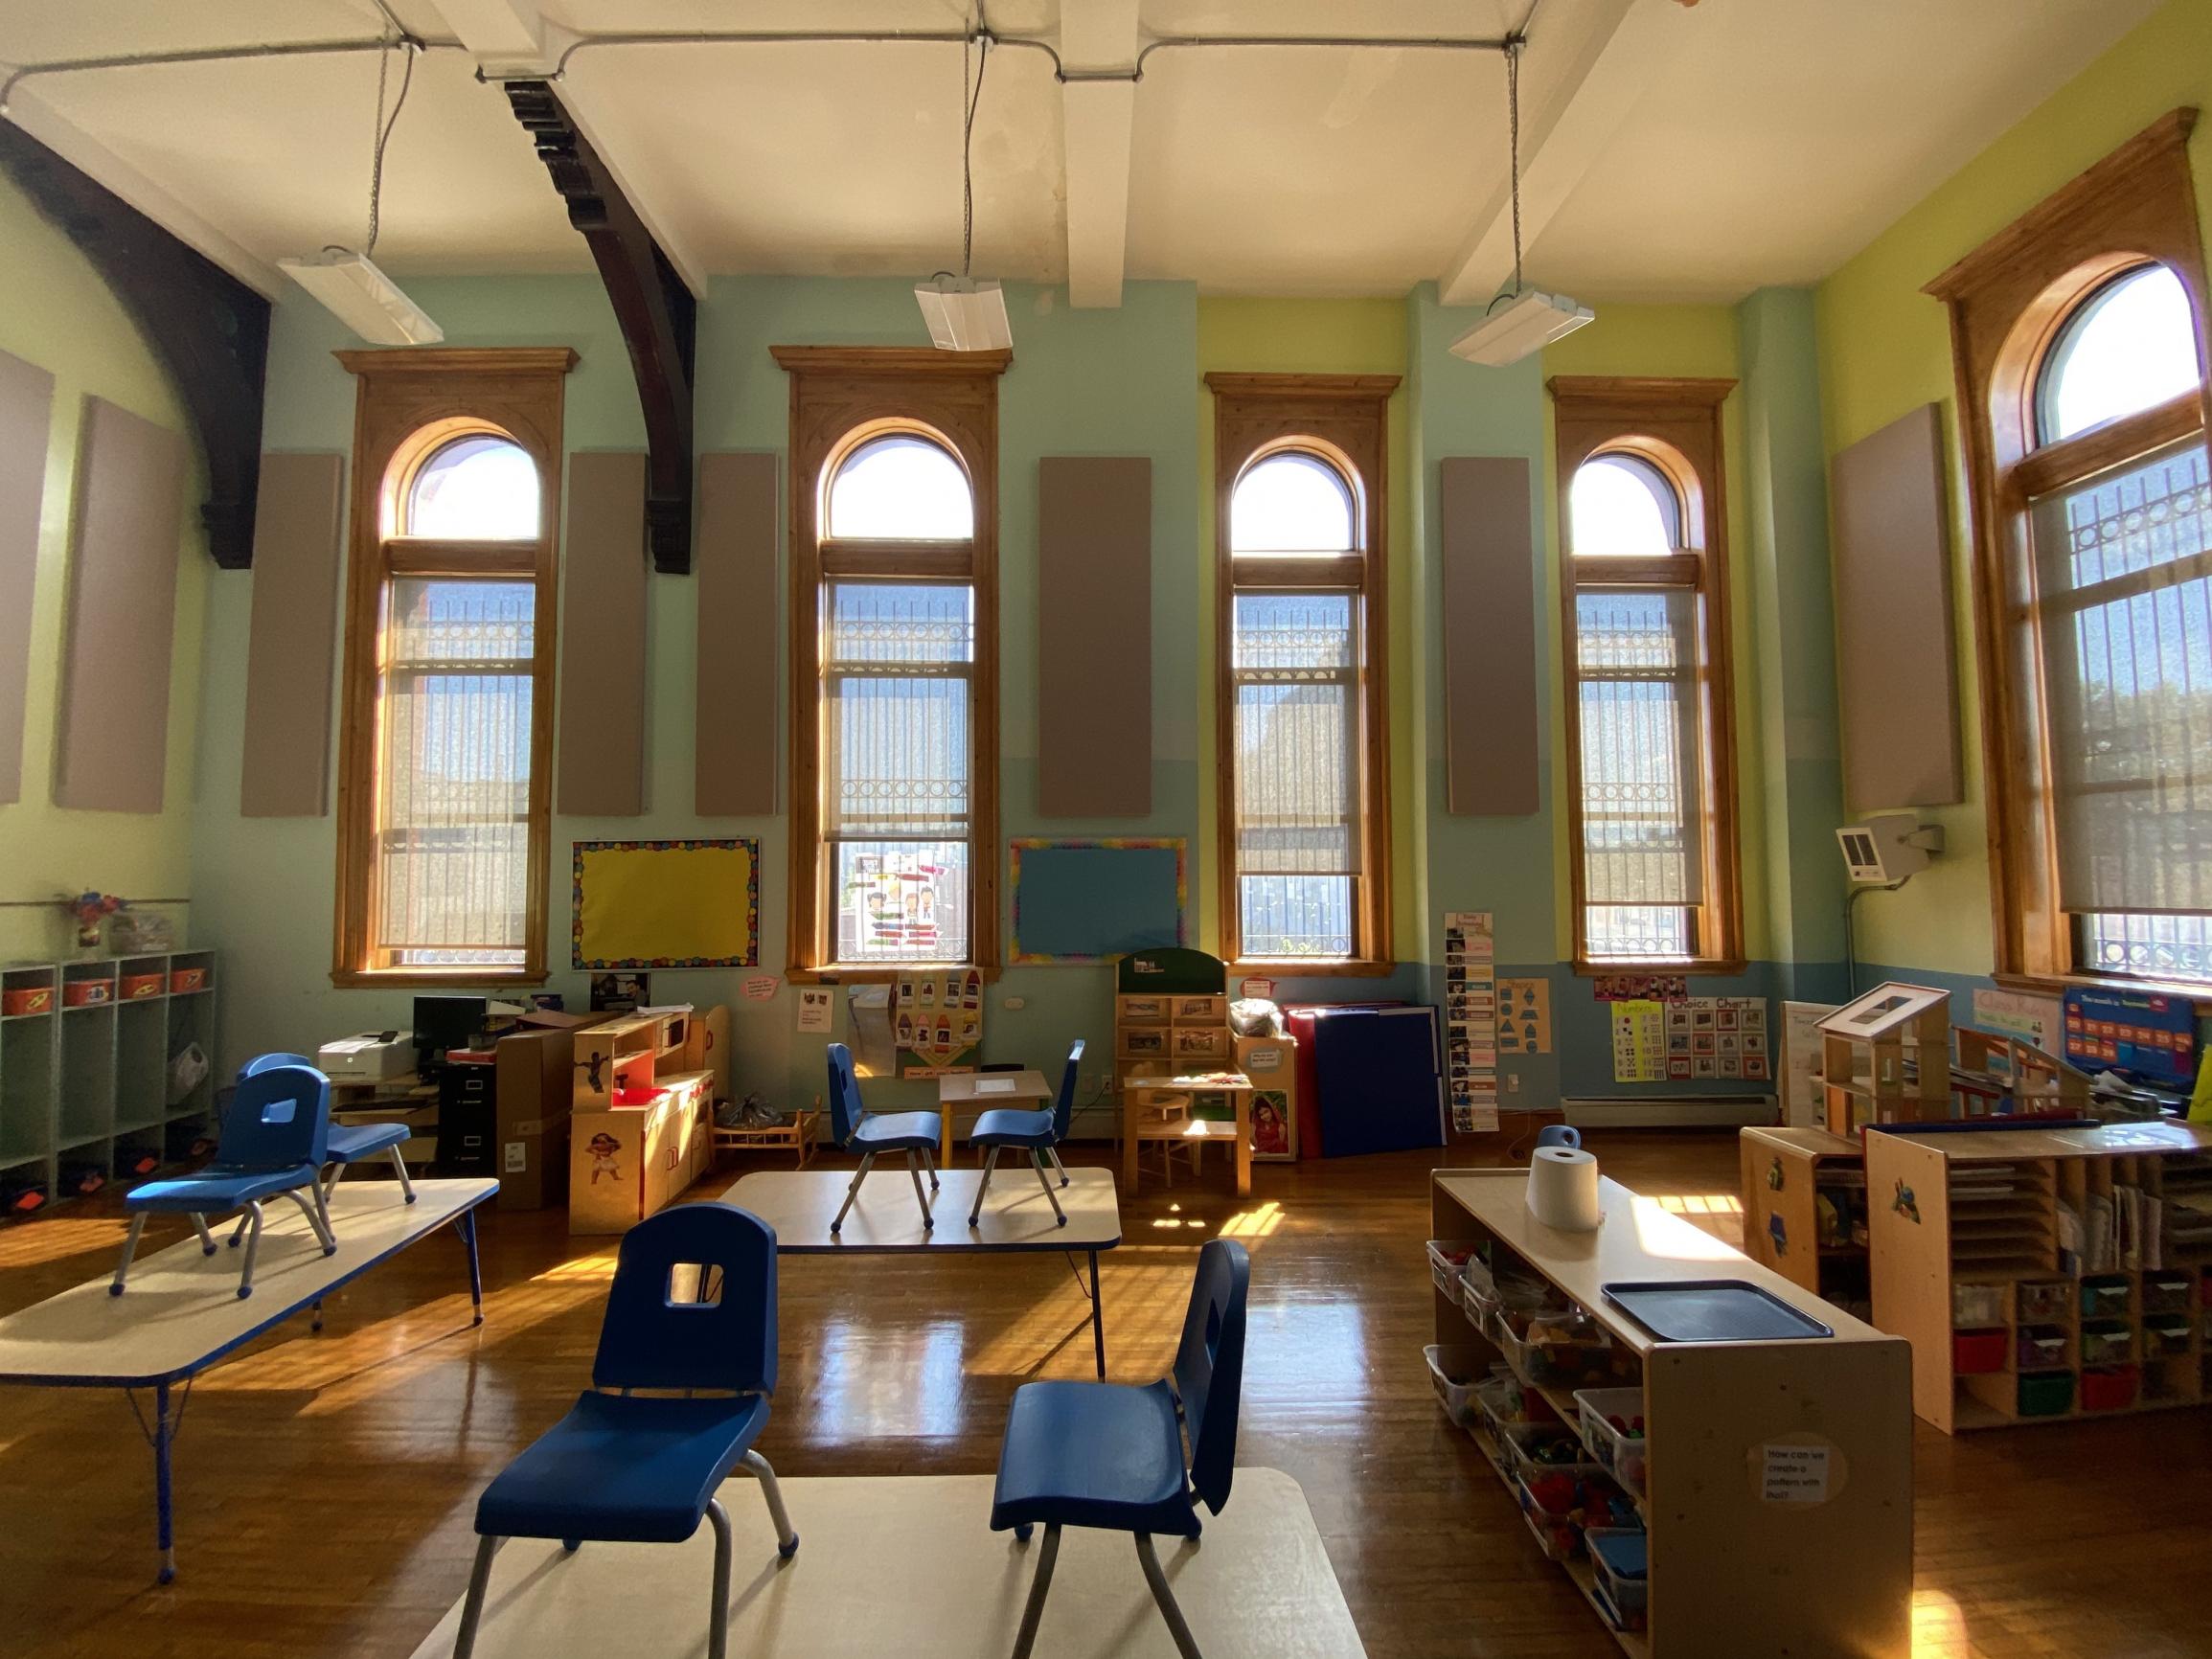 Classroom Echo Reduction